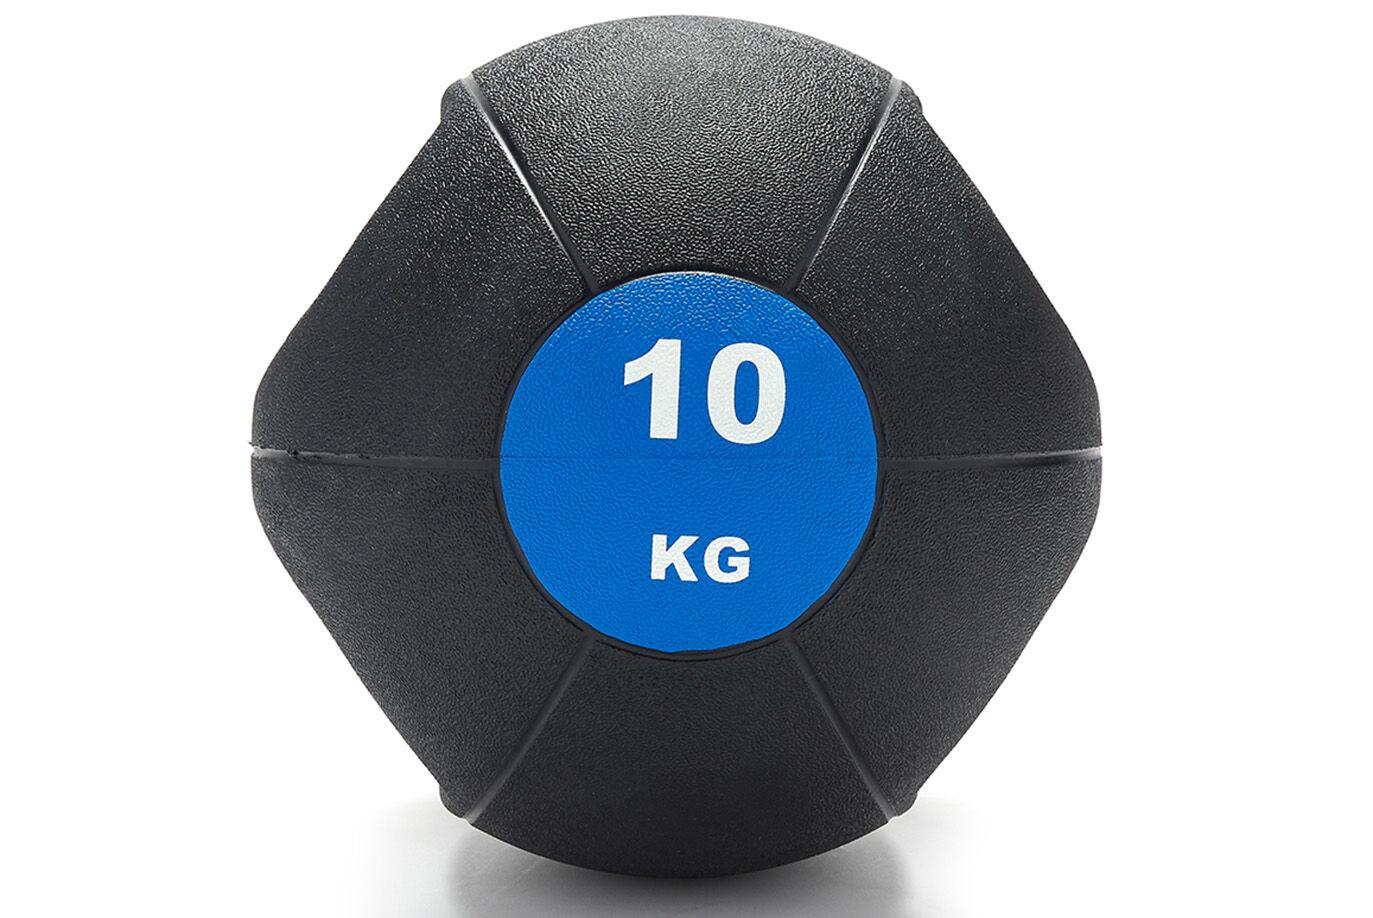 Medicine Ball 10kg by JTX Fitness